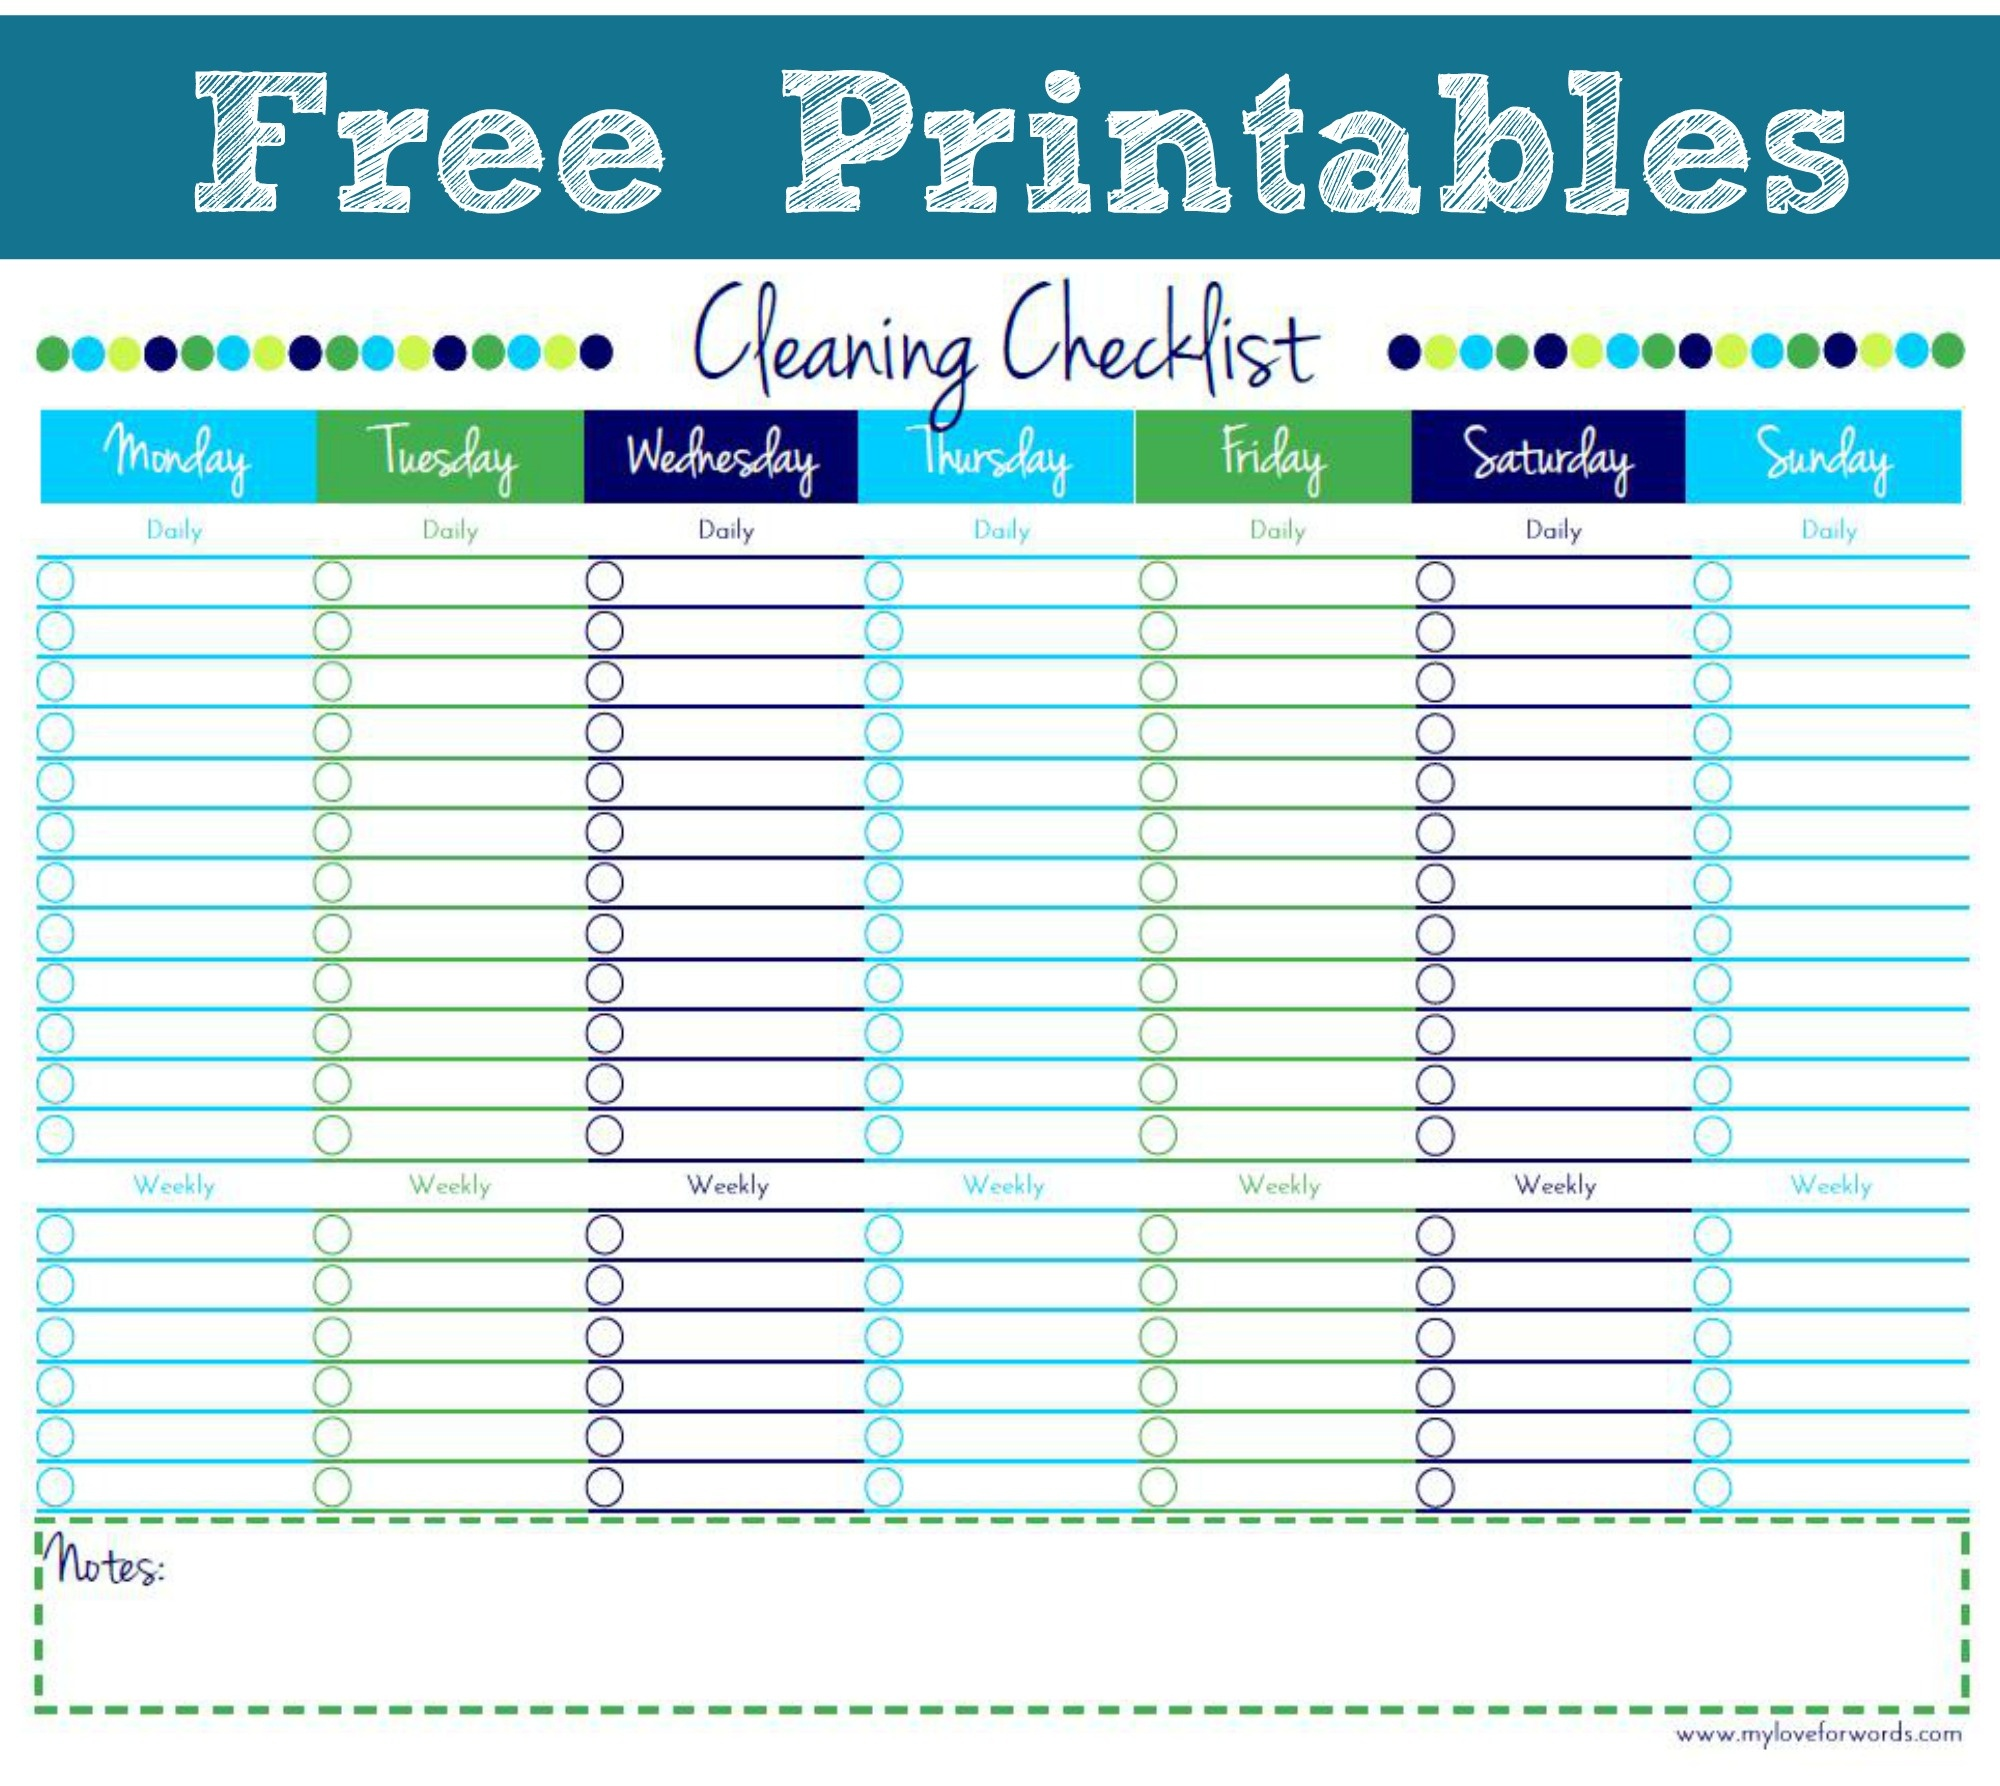 Cleaning Checklist {Free Printable} - Free Printable Checklist